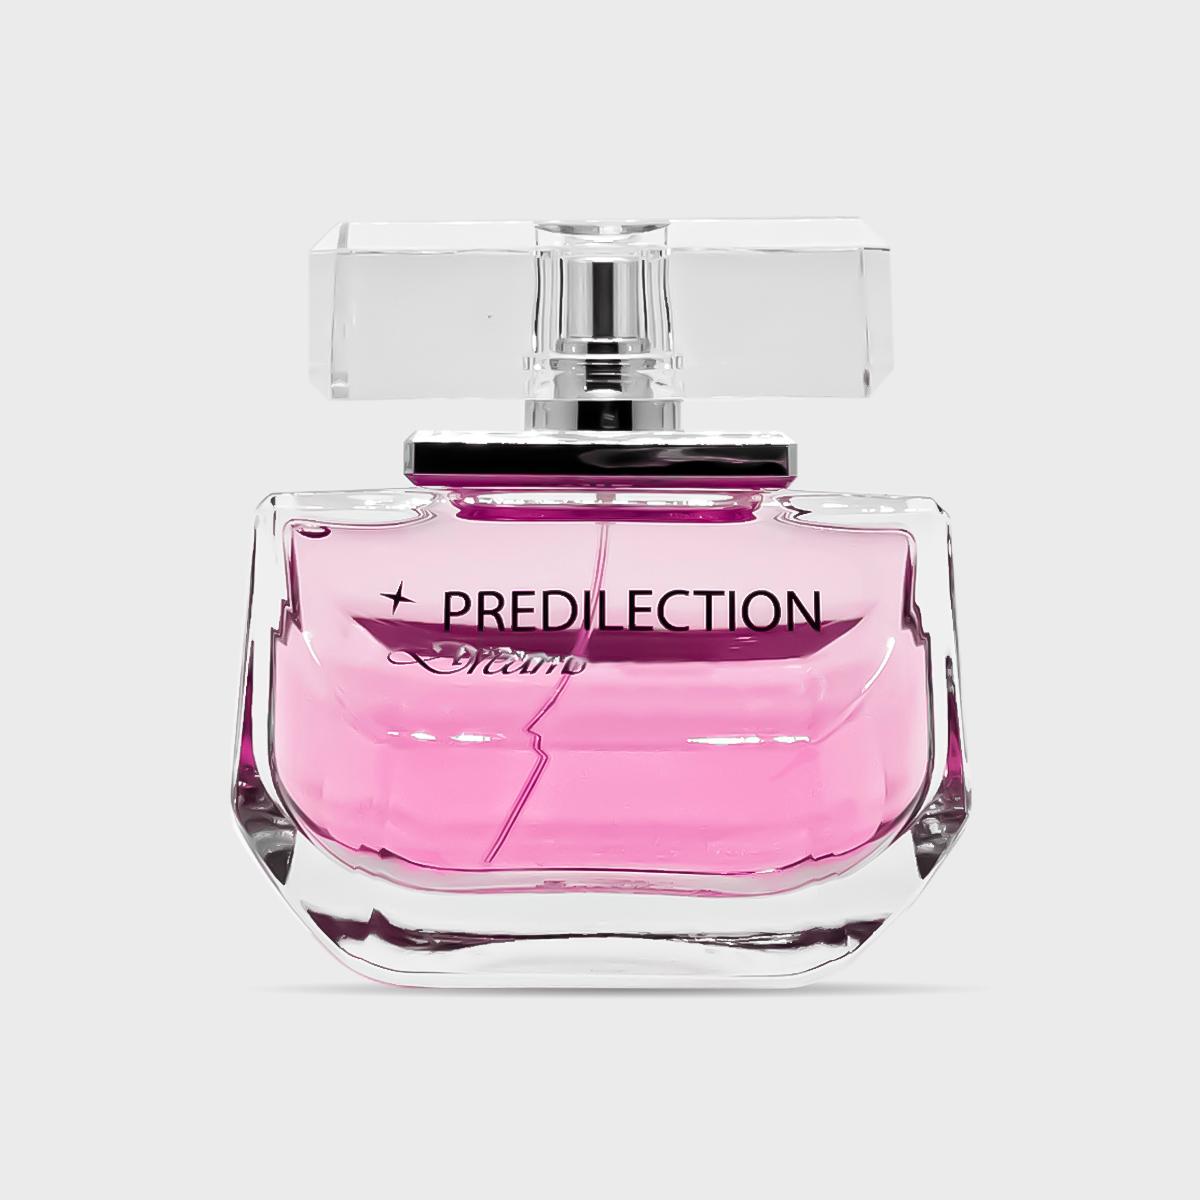 Perfume Predilection Dreams Feminino Edp 100ml Paris Bleu